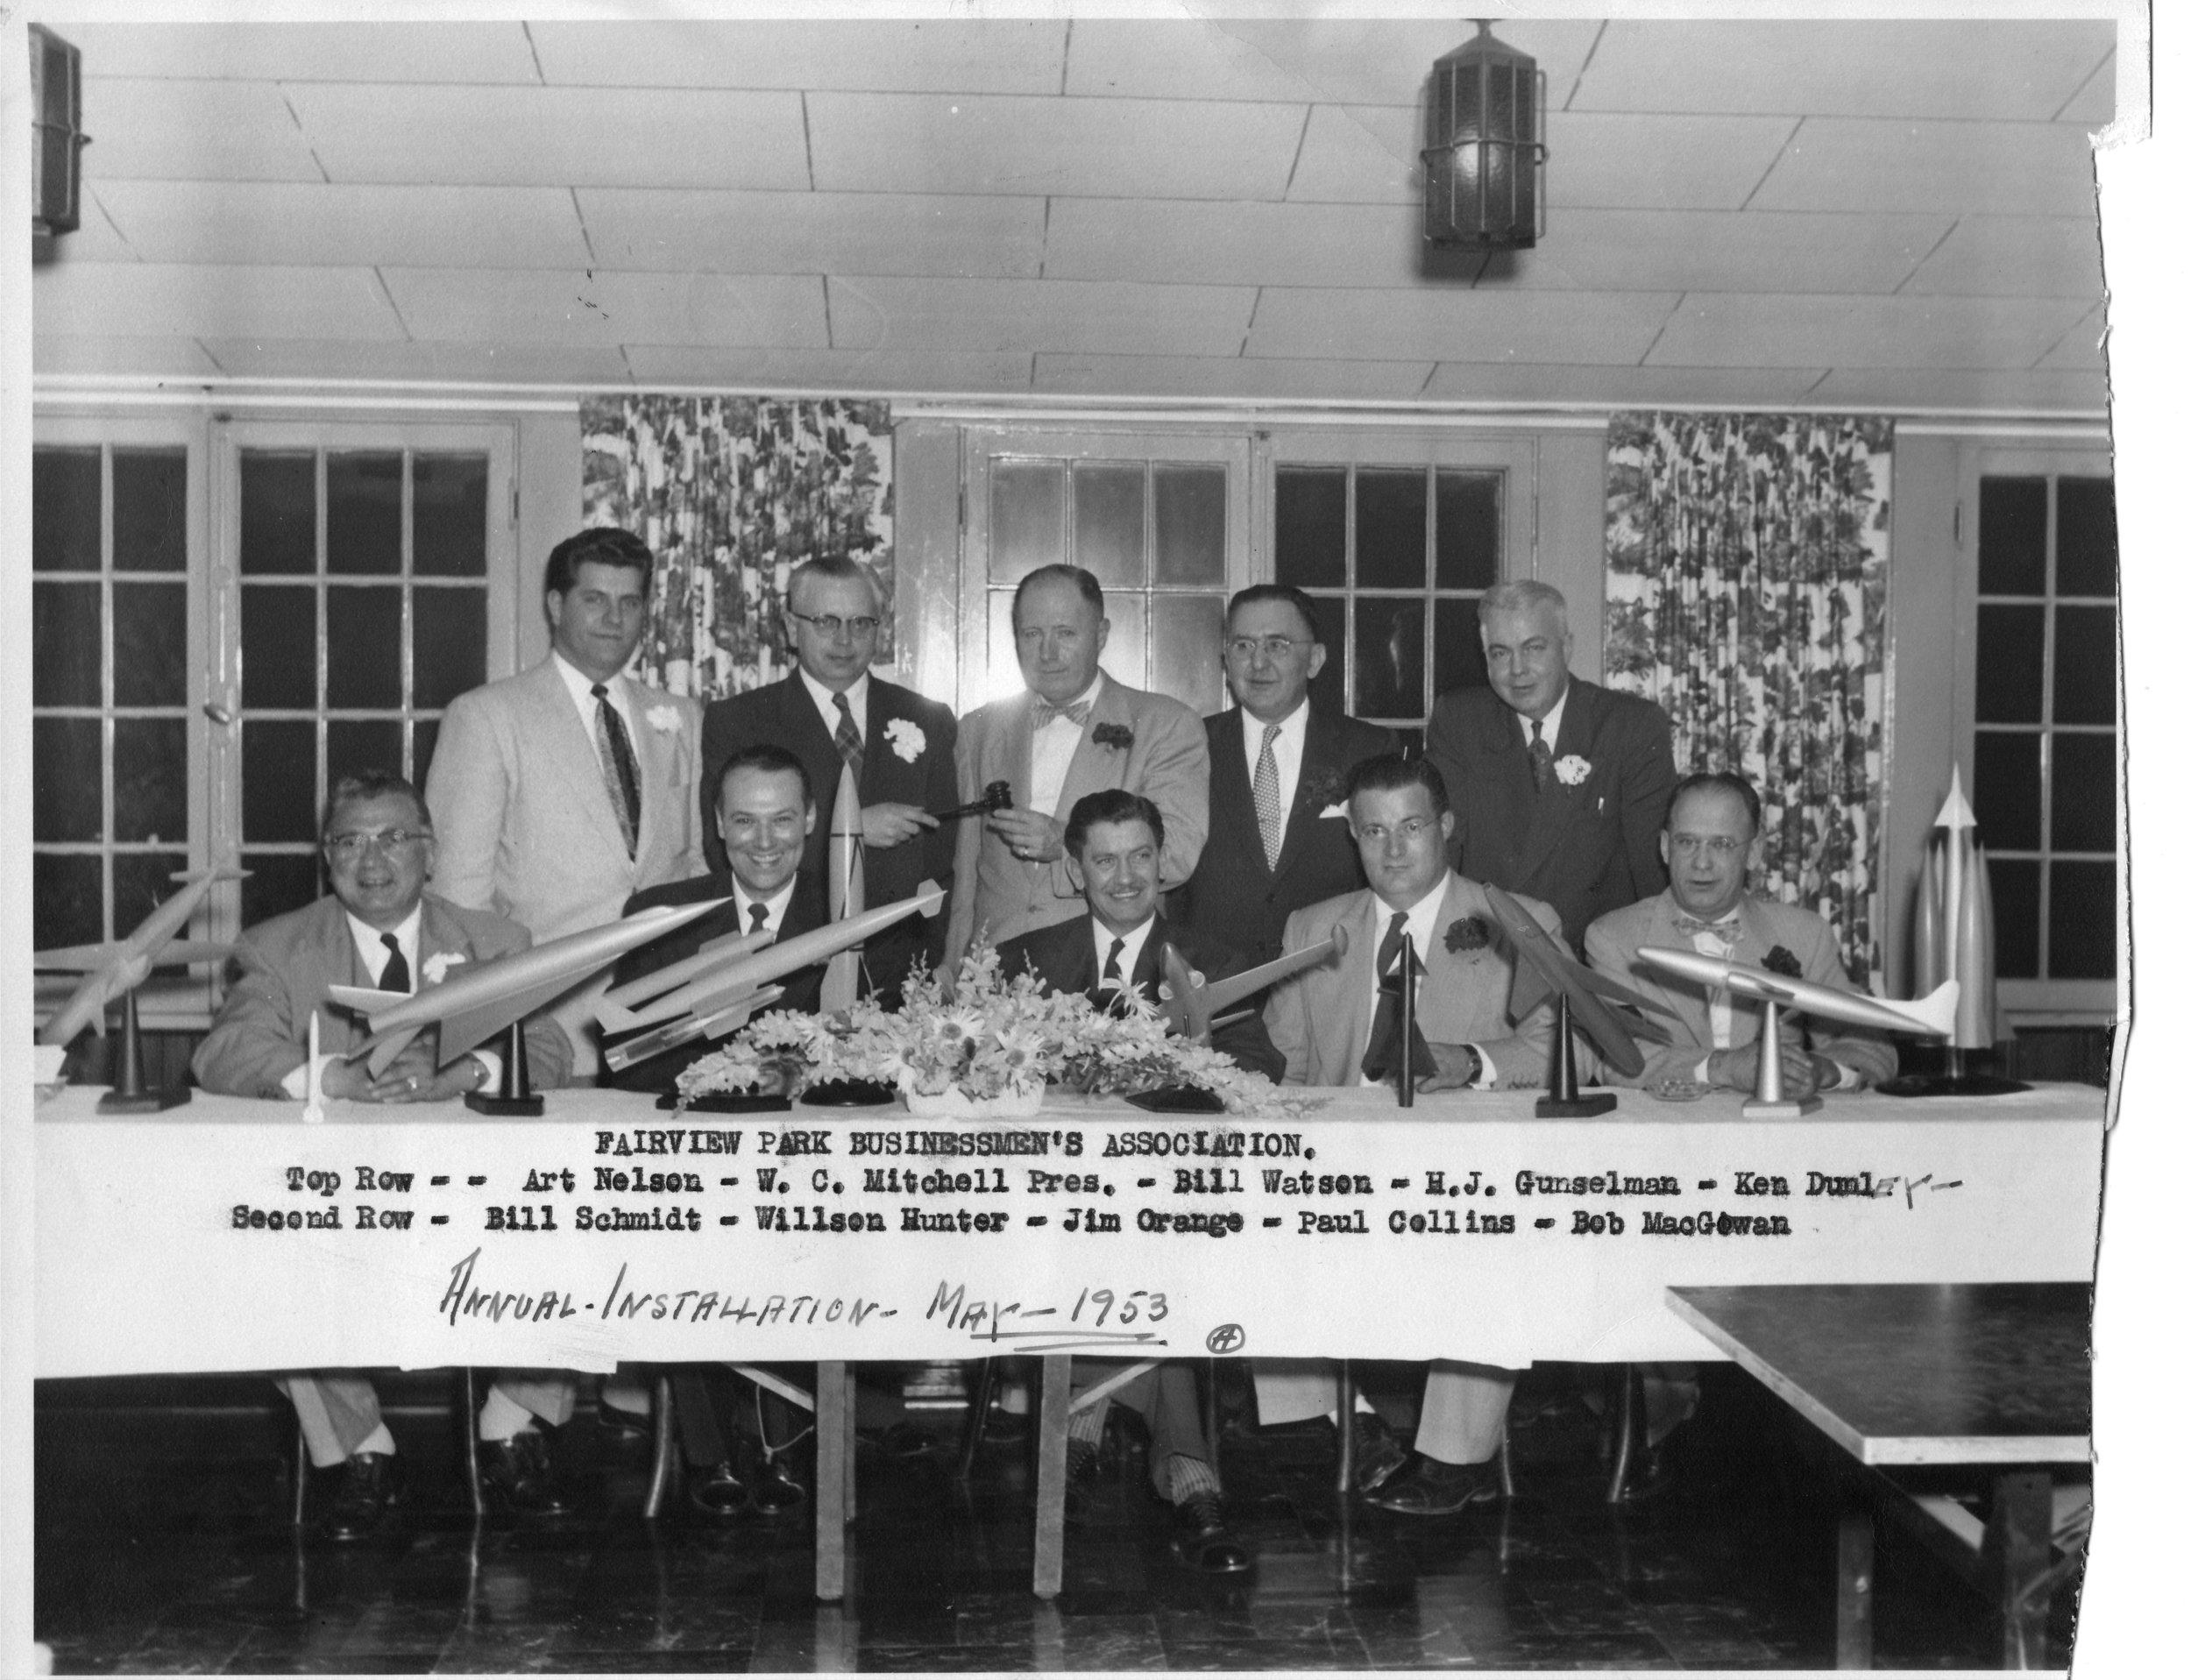 Fairview Park Businessmen's Association 1953.jpg